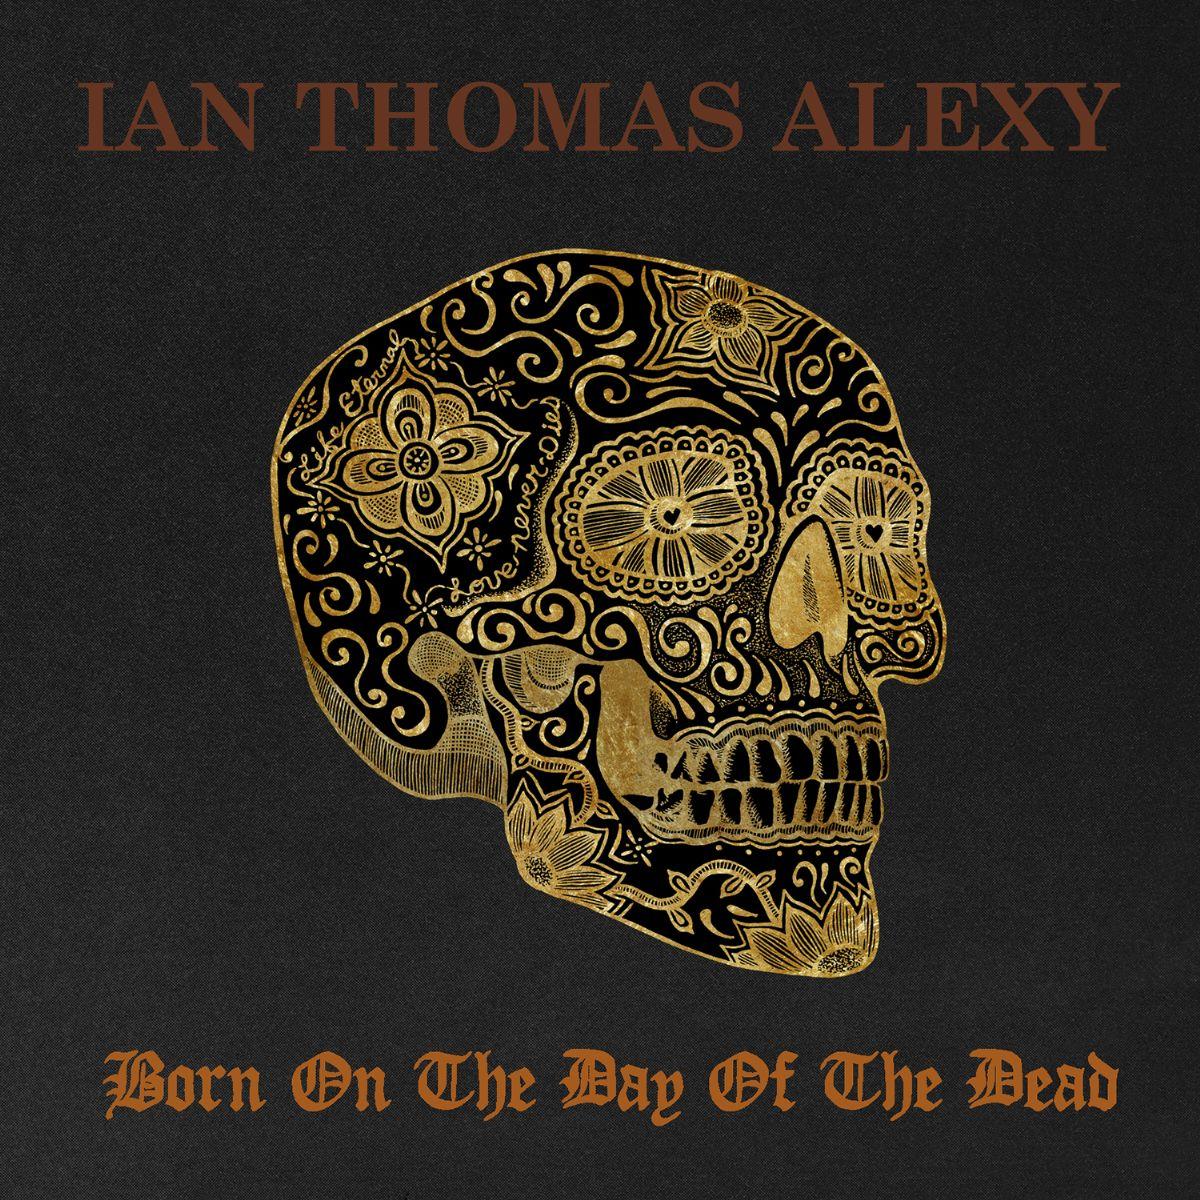 BORN ON THE DAY OF THE DEAD Ian Thomas Alexy